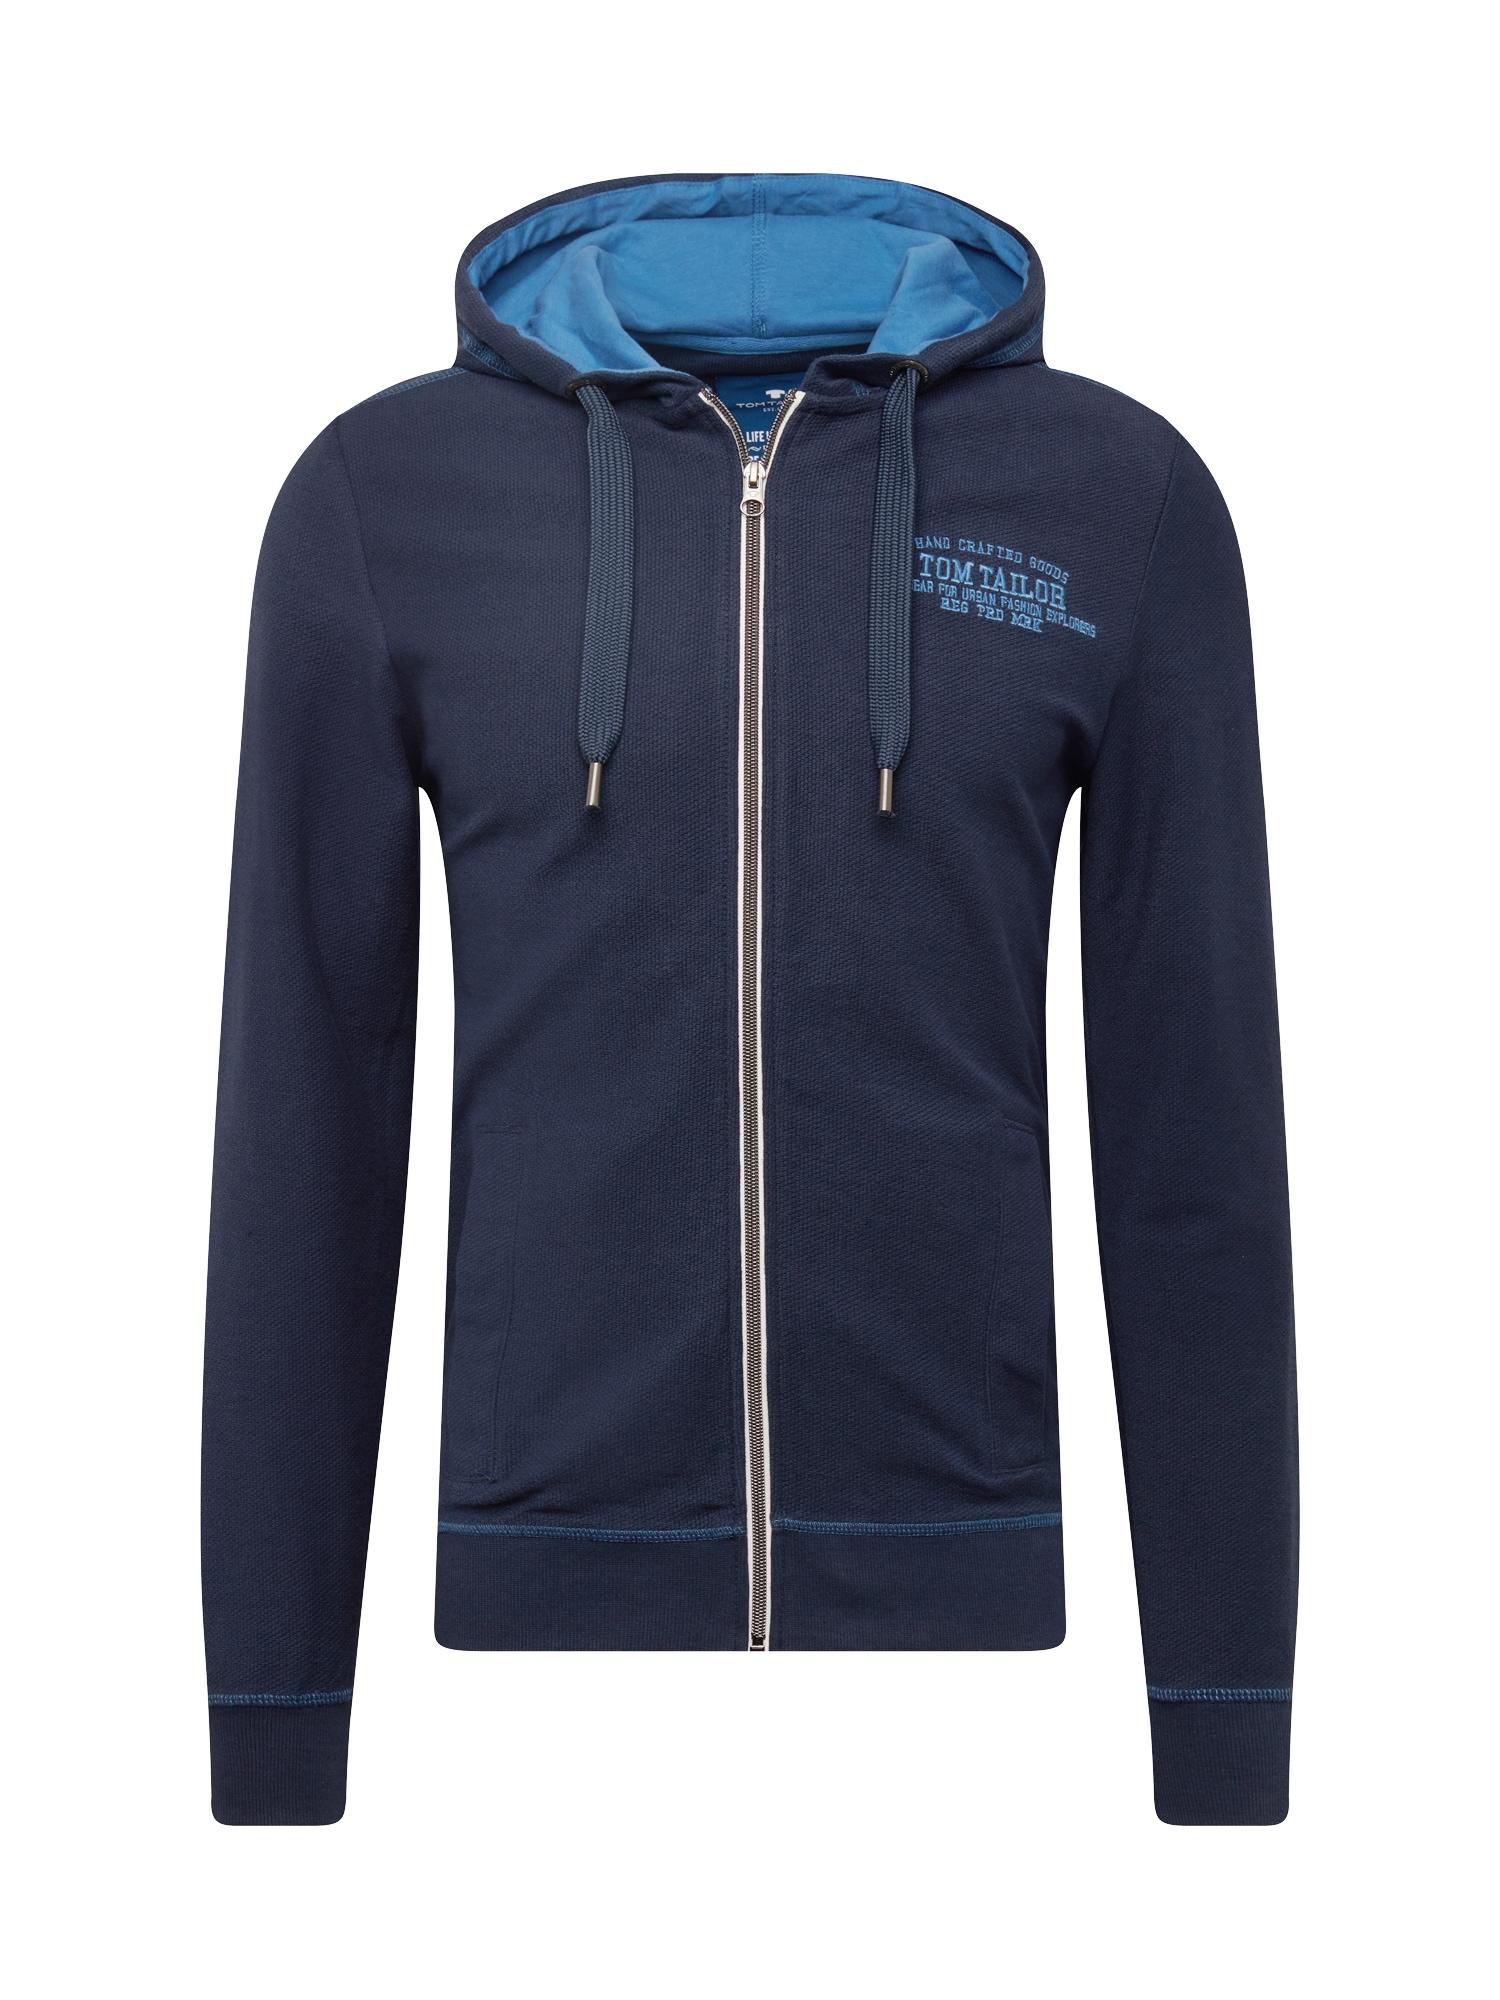 Mikina s kapucí sweat jacket with hood modrá TOM TAILOR